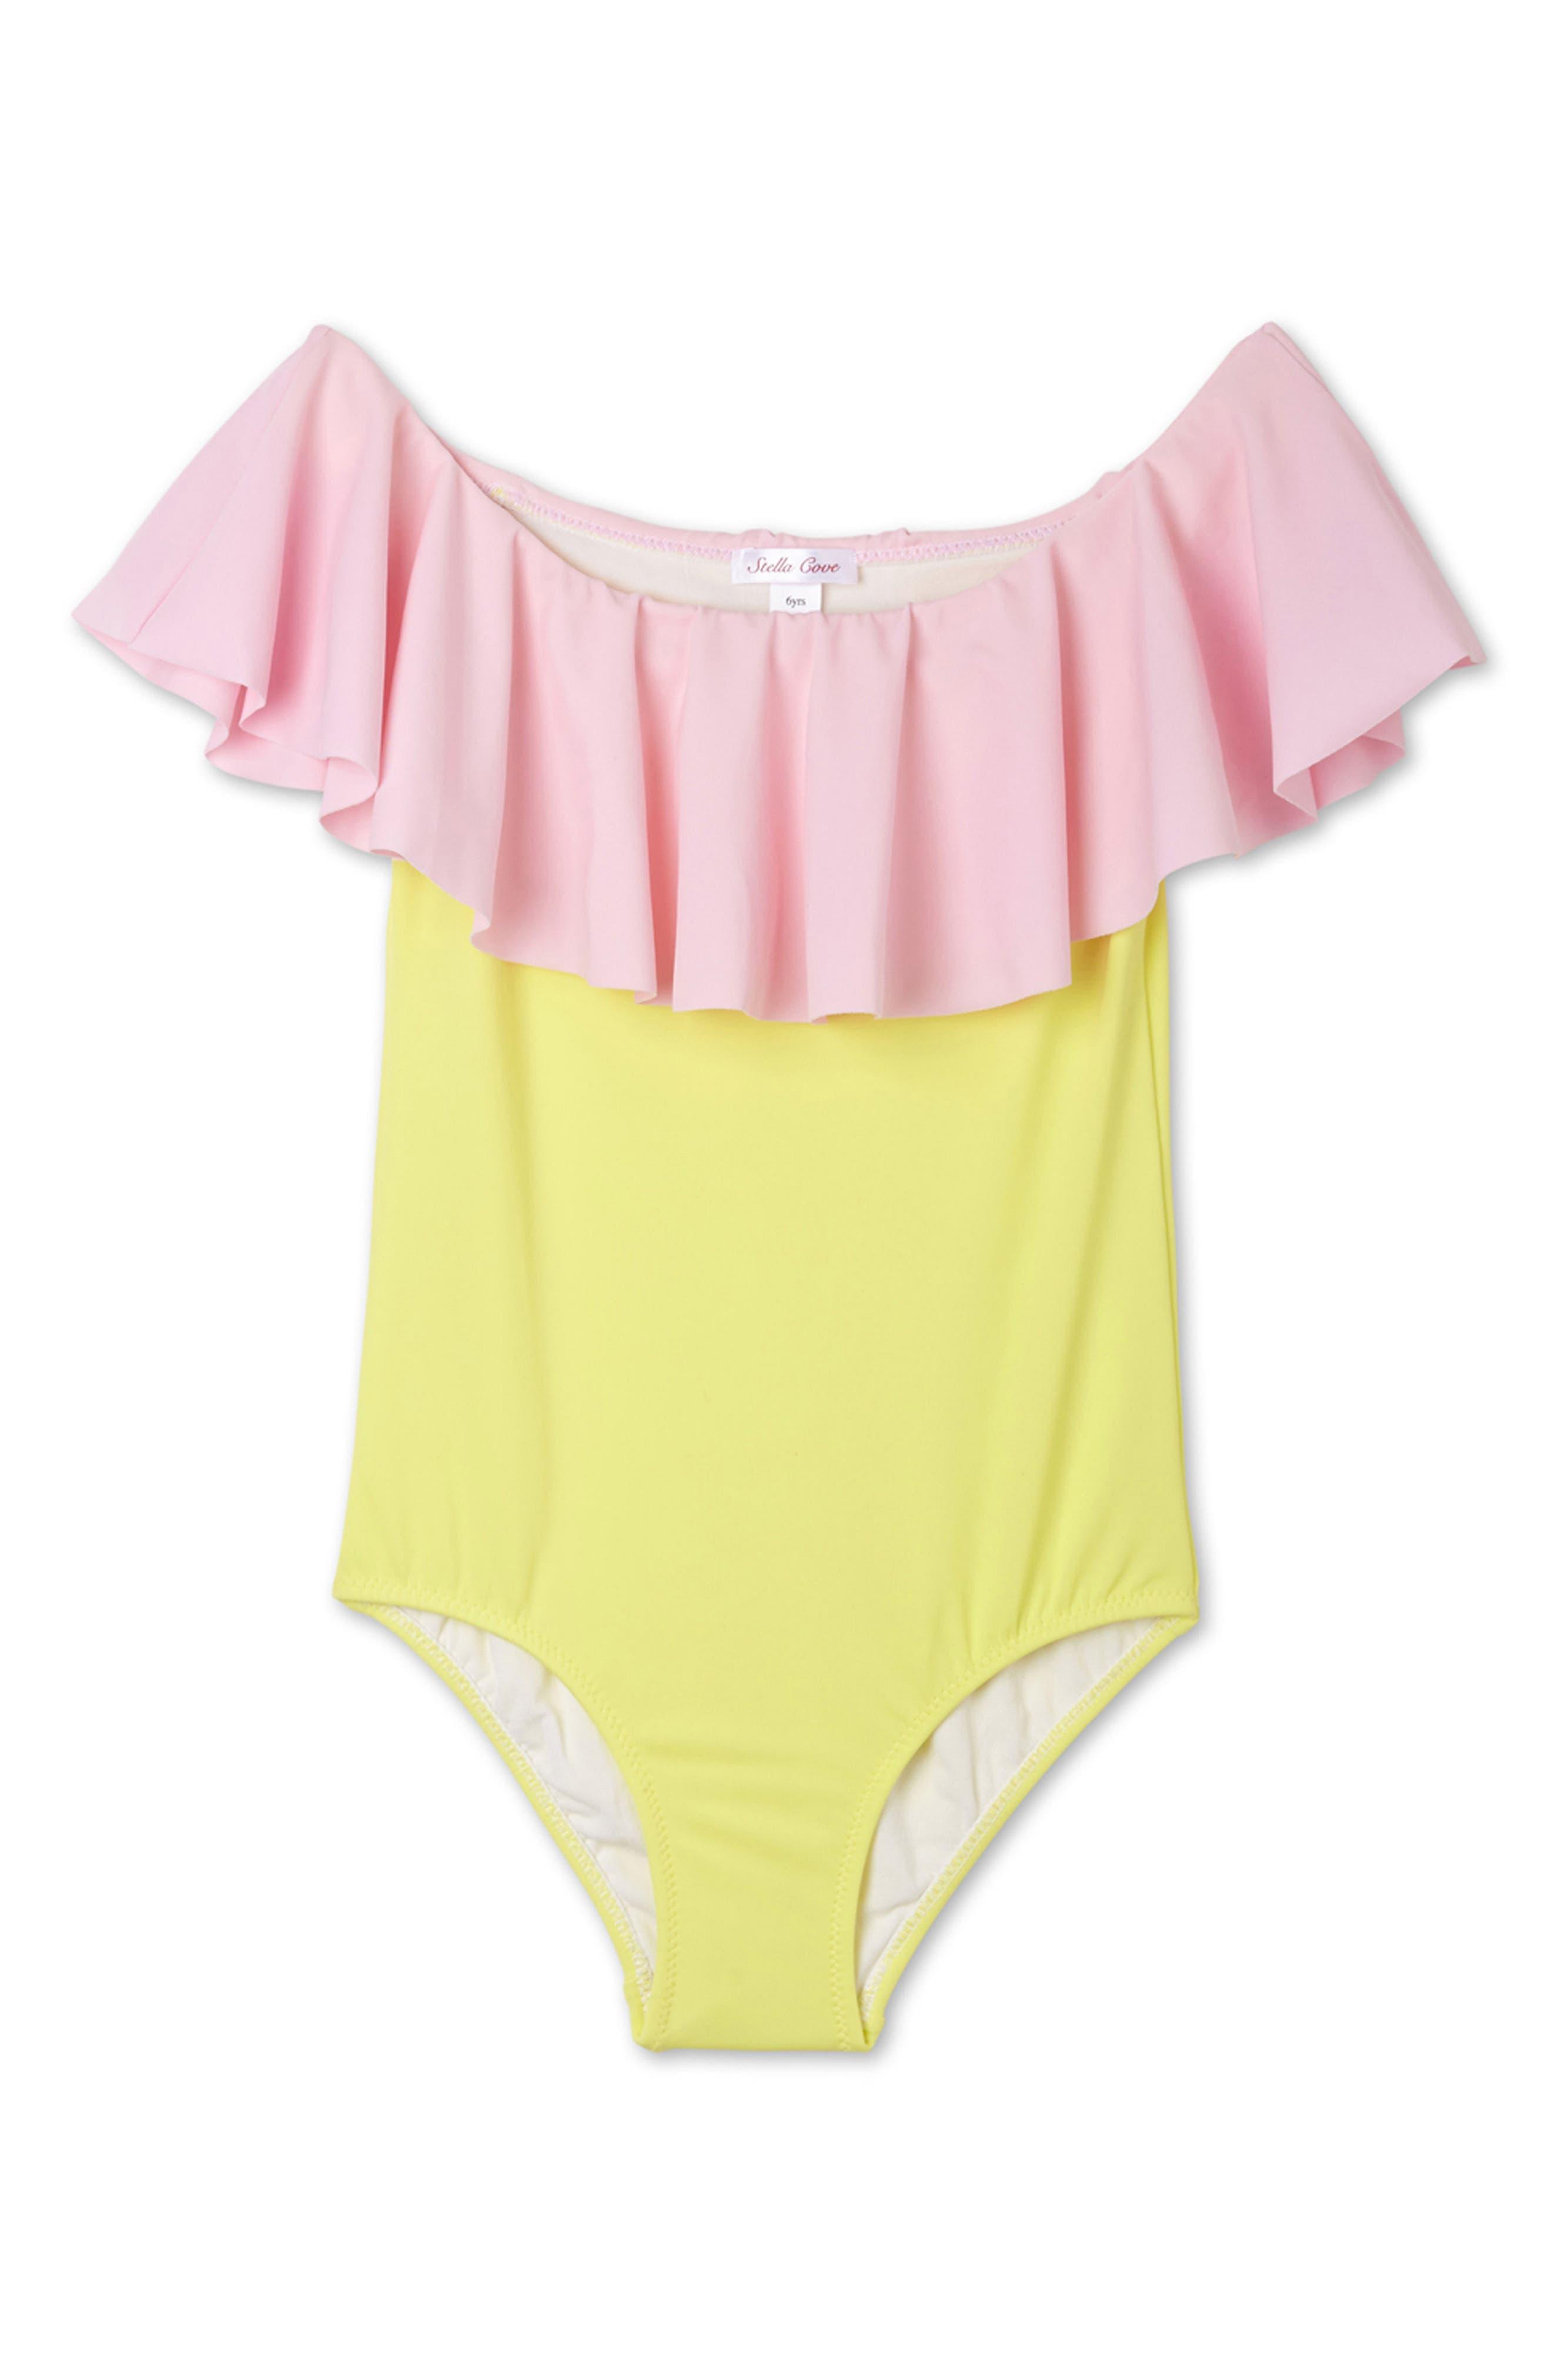 Main Image - Stella Cove Ruffle One-Piece Swimsuit (Toddler Girls & Little Girls)